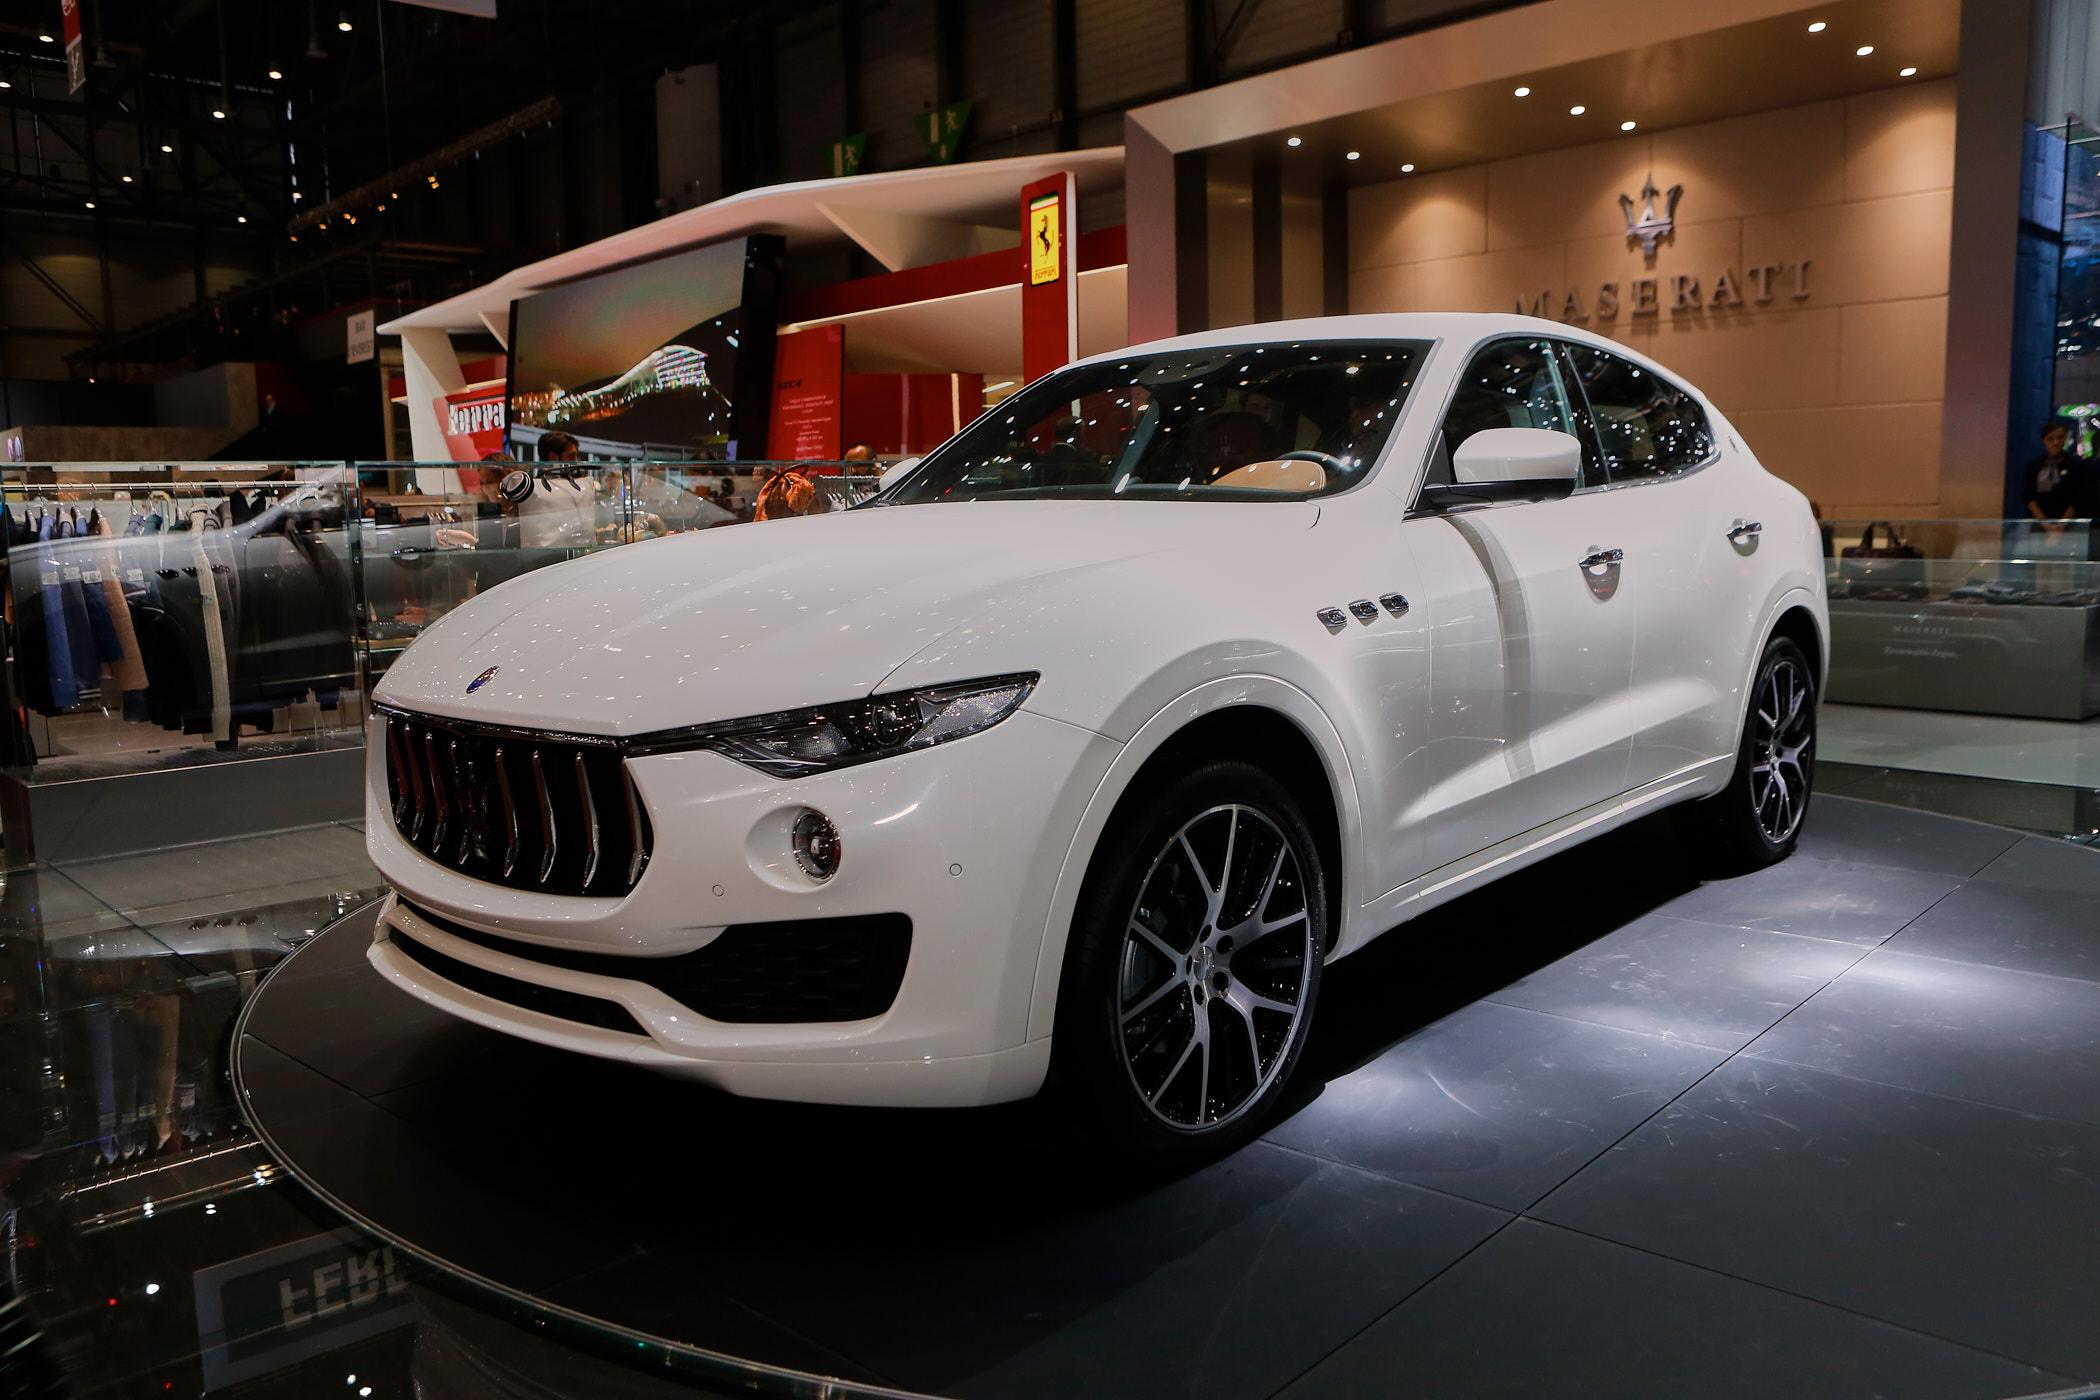 Maserati suv 2016